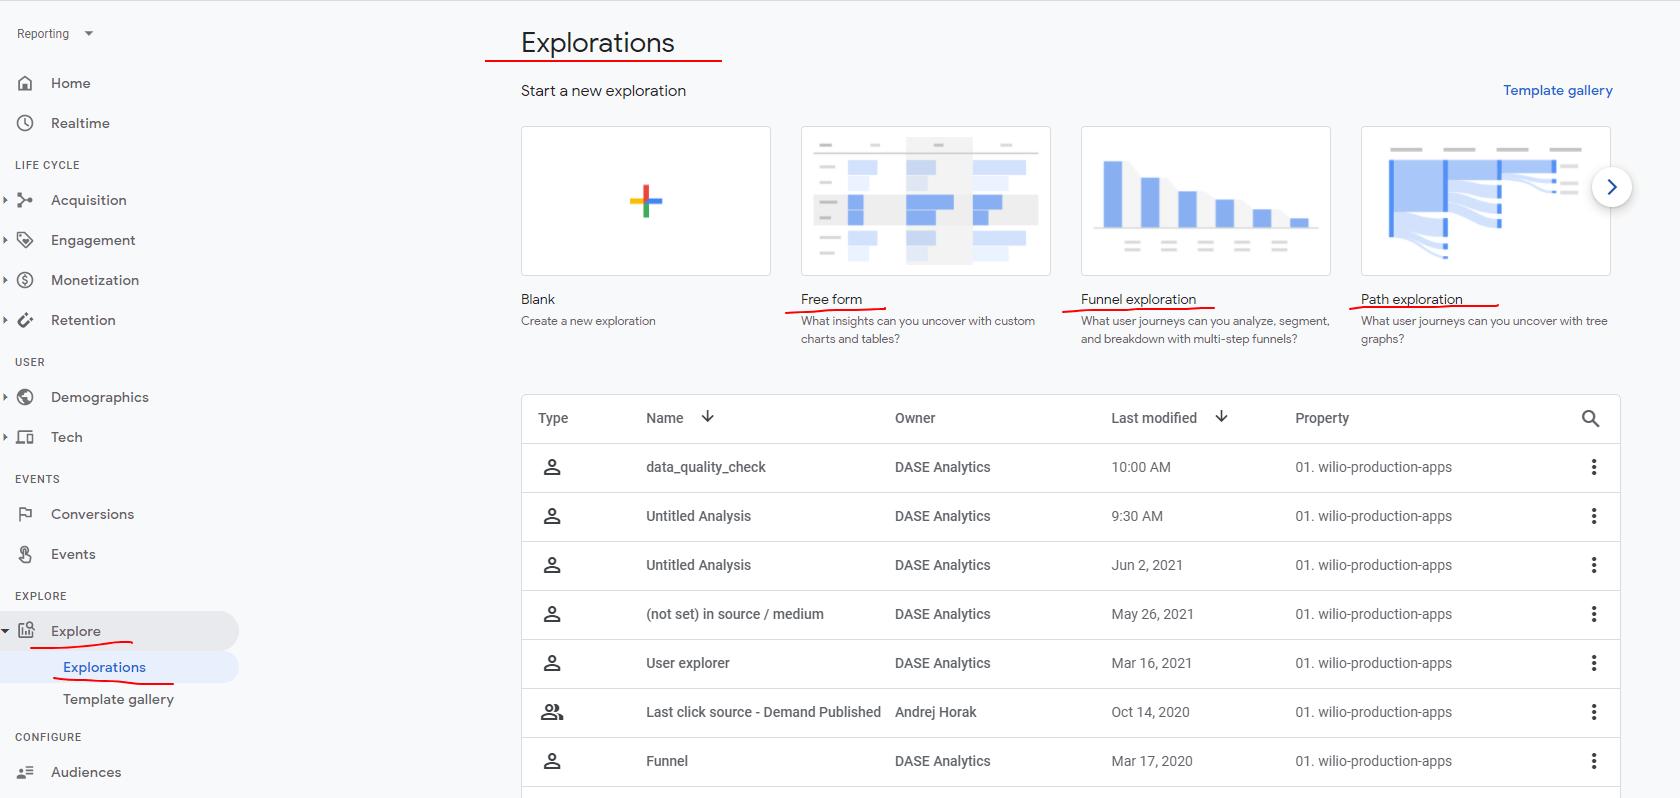 explore analysis hub ga4